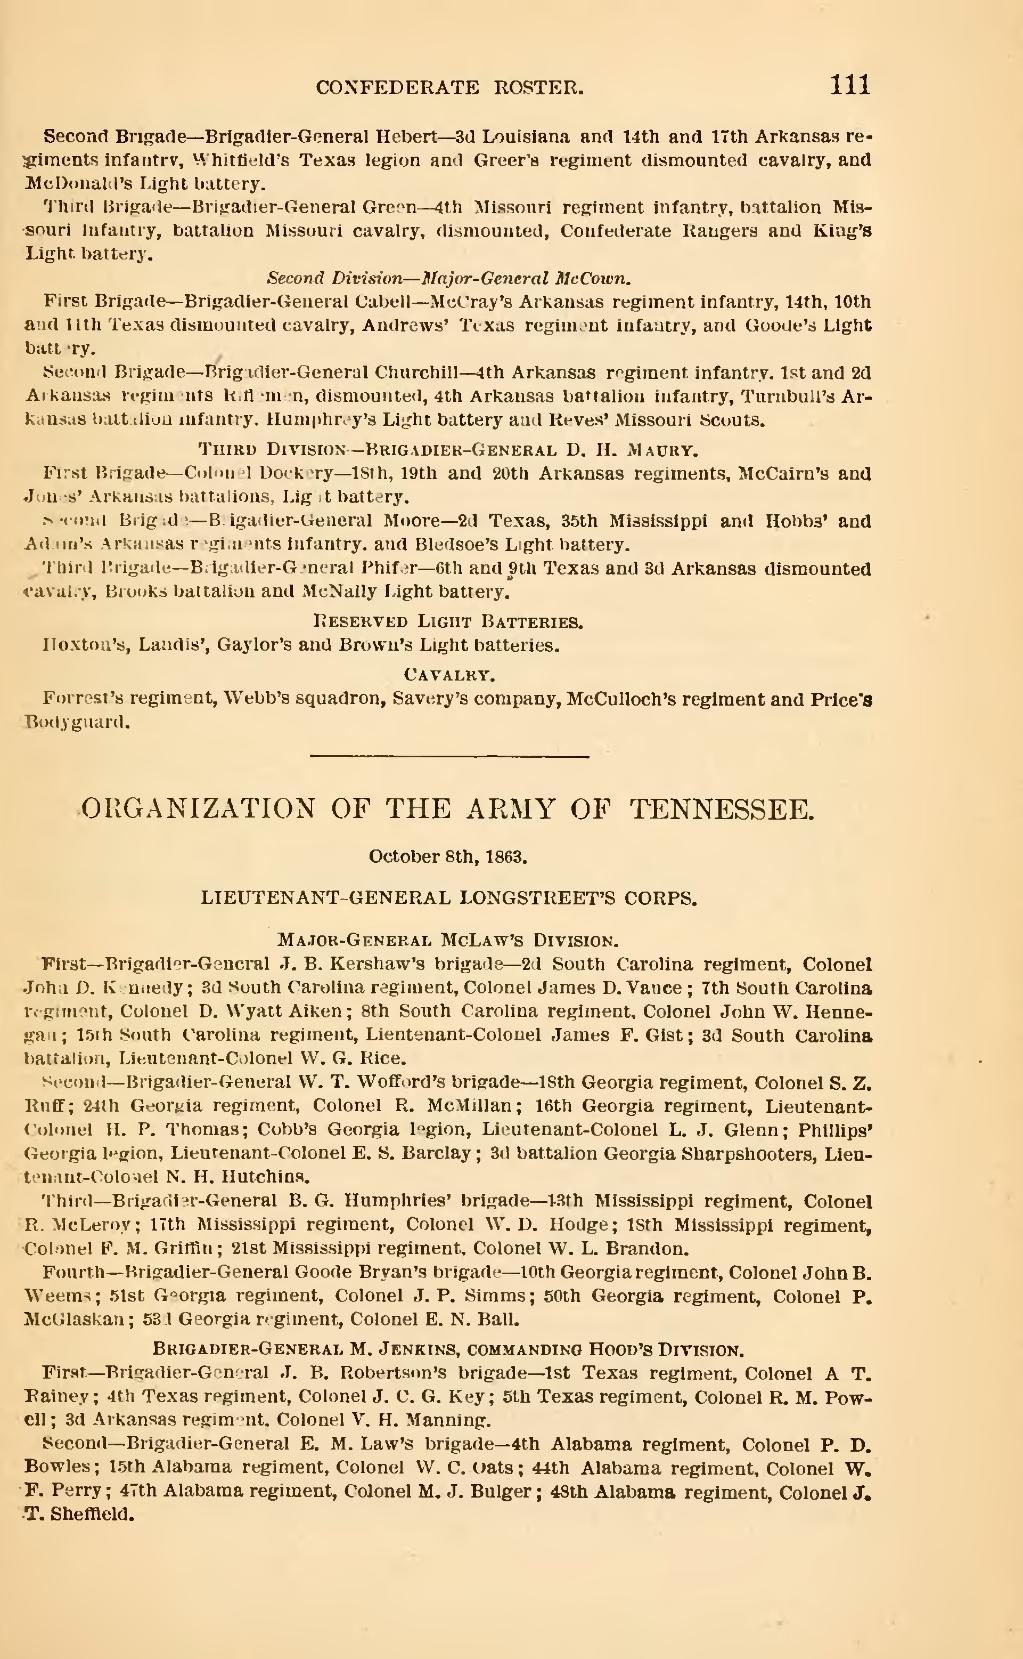 ... Colonel P. D. Bowles; 15th Alabama regiment, Colonel W. C. Oats; 44th Alabama  regiment, Colonel W. F. Perry; 47th Alabama regiment, Colonel M. J. Bulger  ...